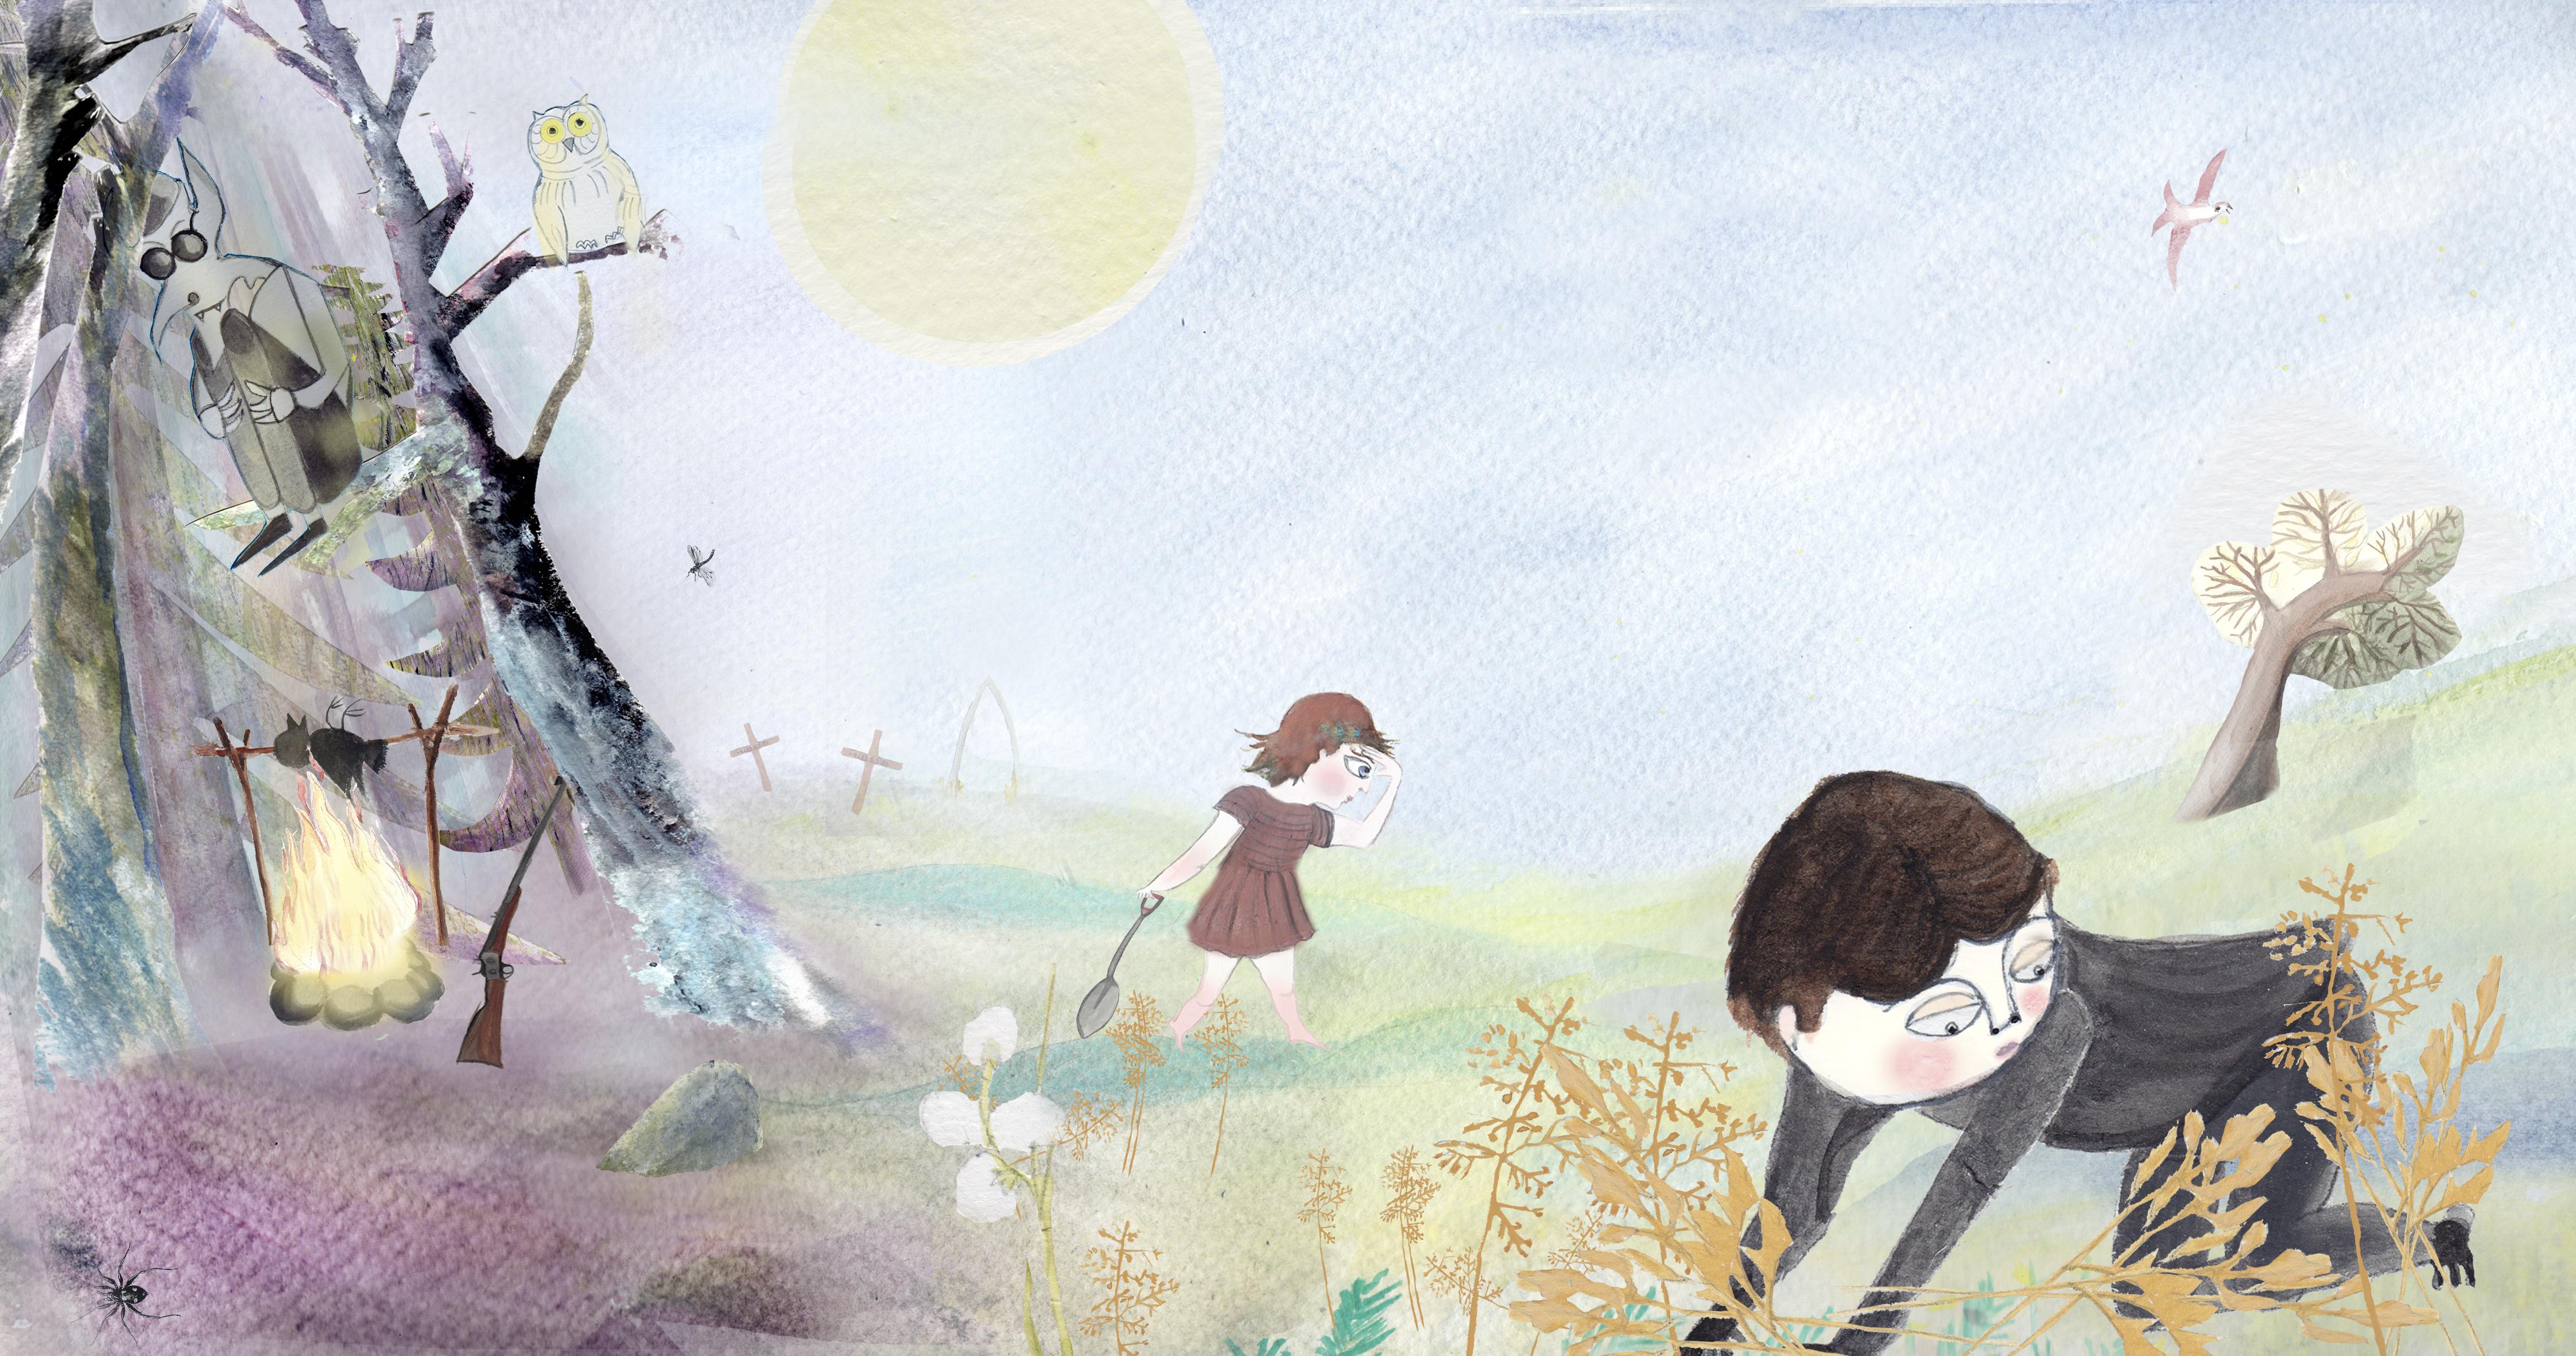 searching in a field